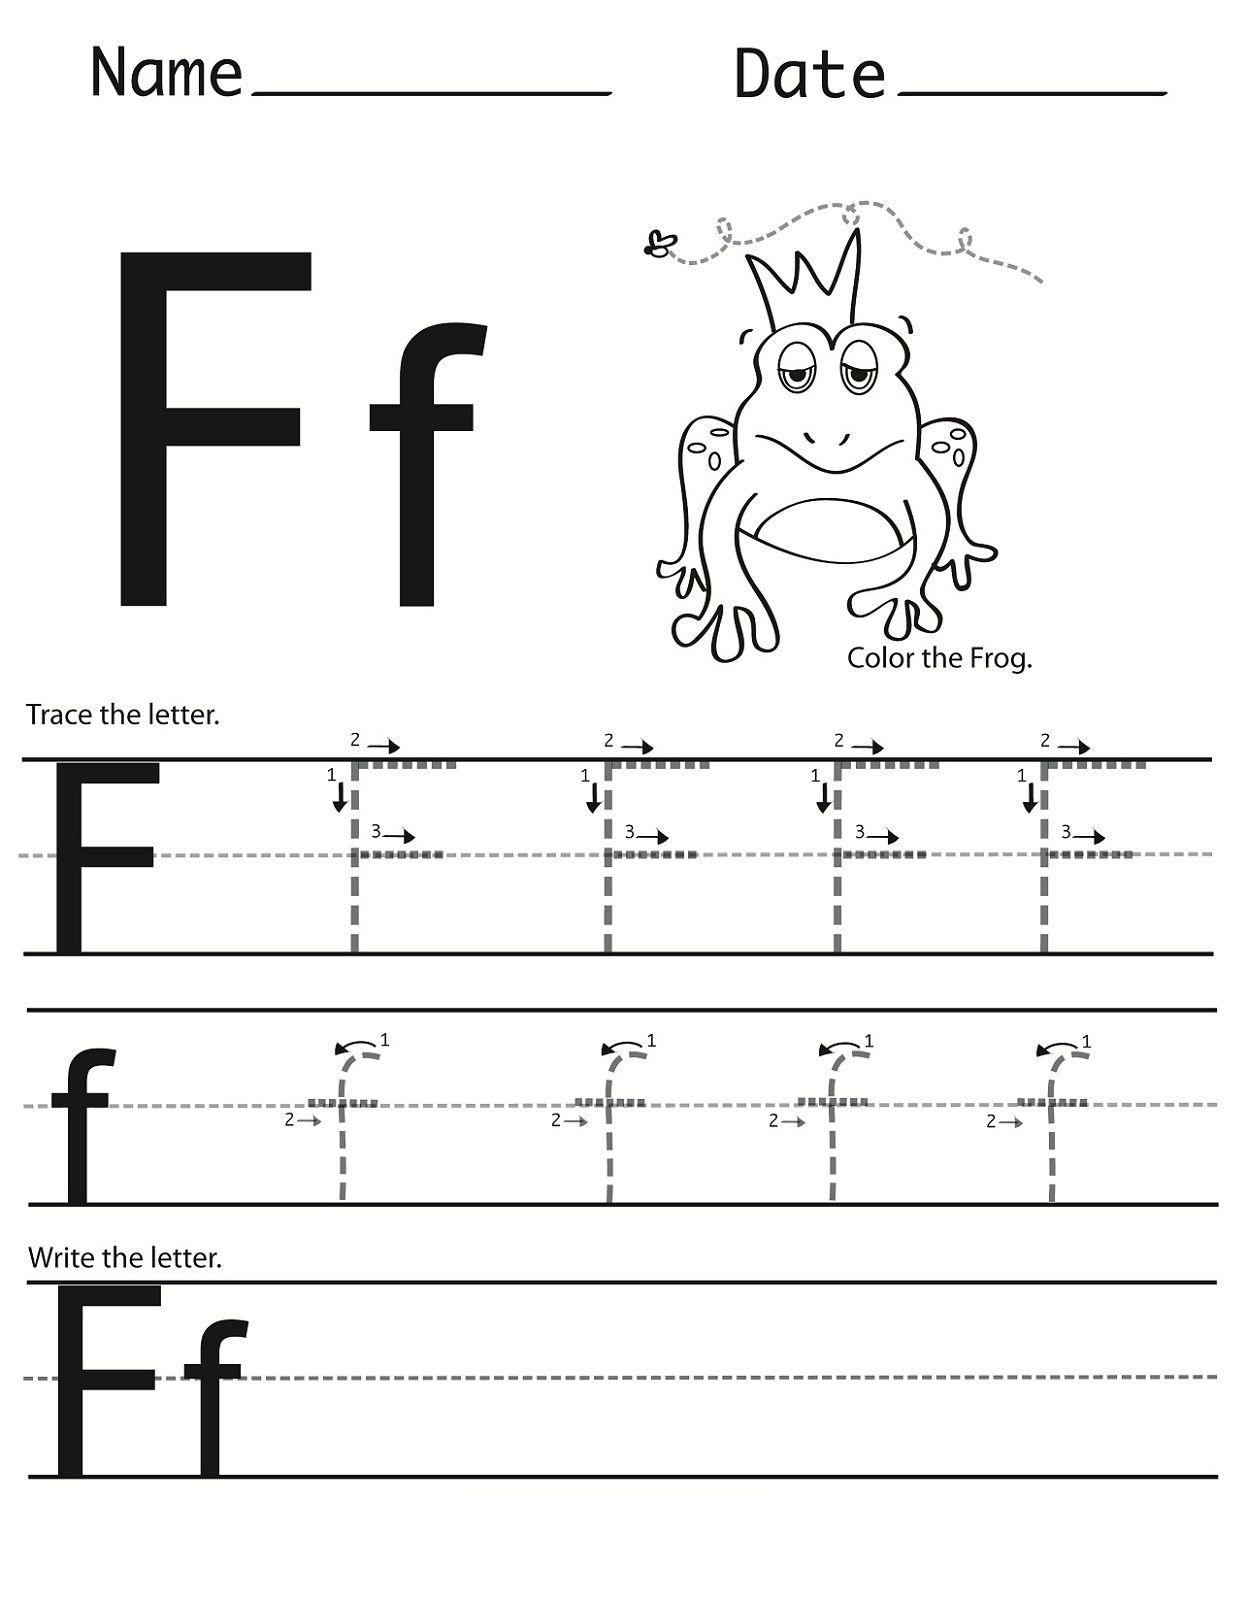 Letter F Worksheet For Preschool And Kindergarten in Letter F Worksheets For Kindergarten